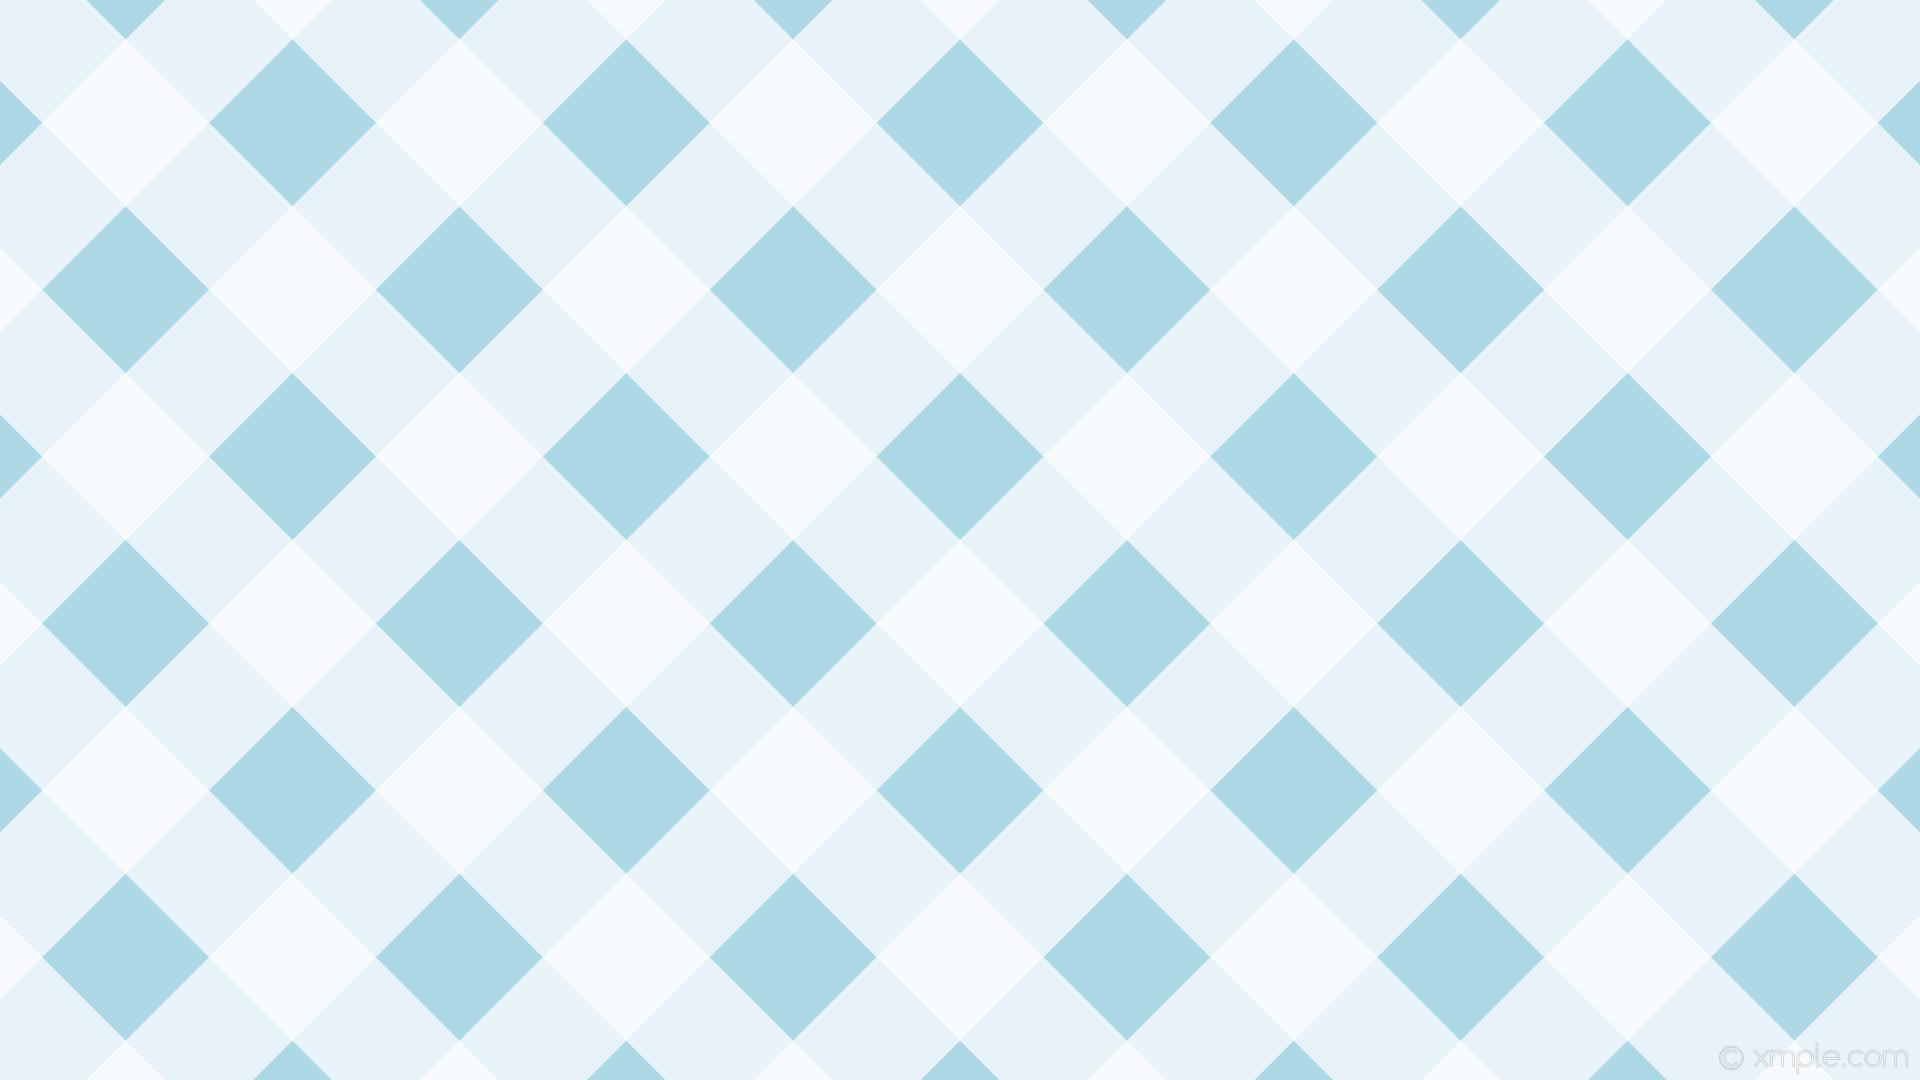 wallpaper striped blue checker white gingham light blue #add8e6 #ffffff  315° 118px